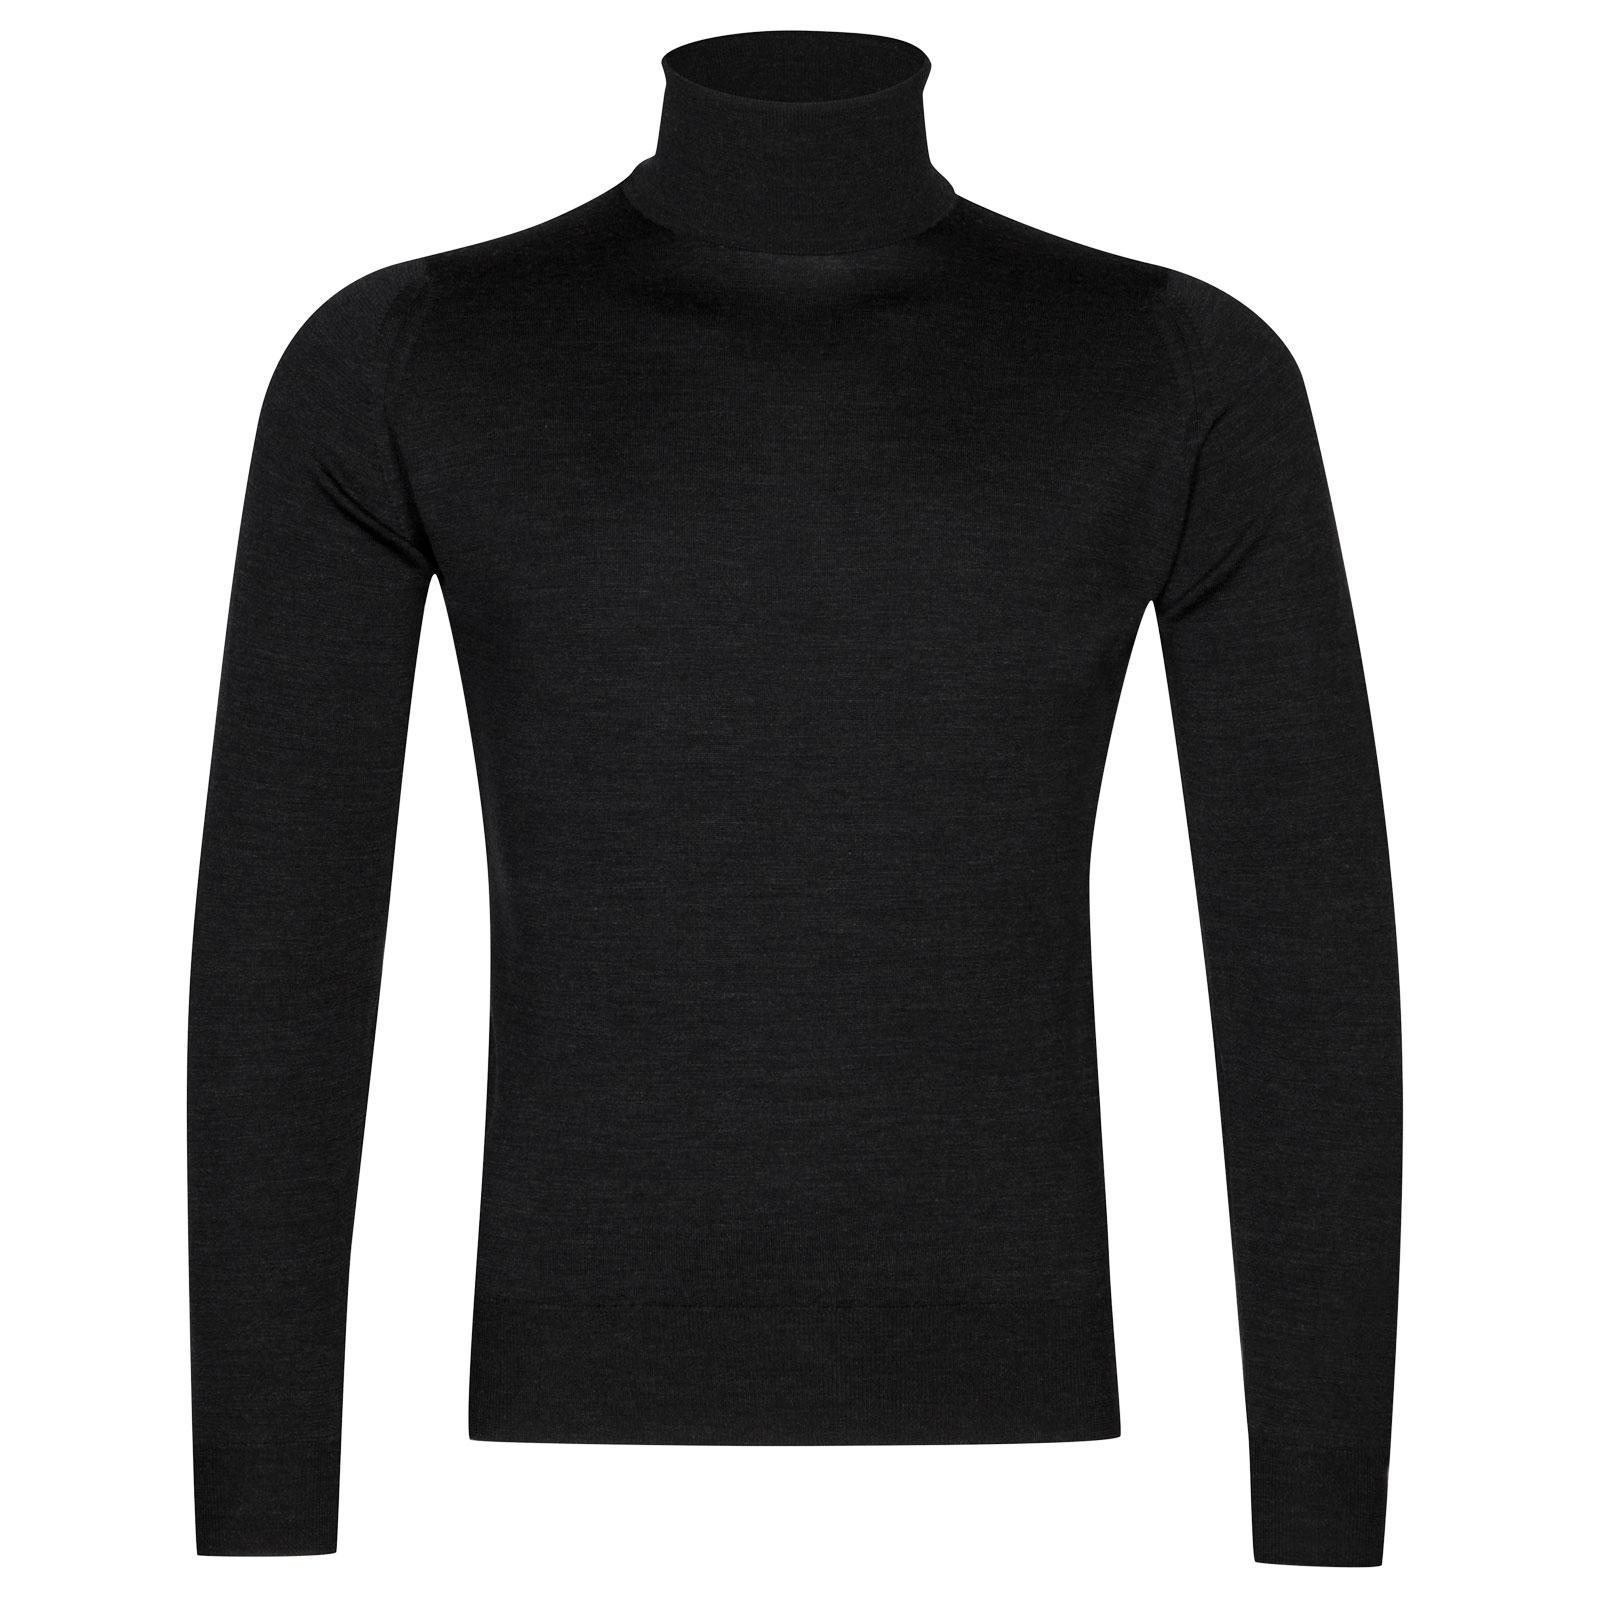 John Smedley Orta Merino Wool Pullover in Hepburn Smoke-XXL